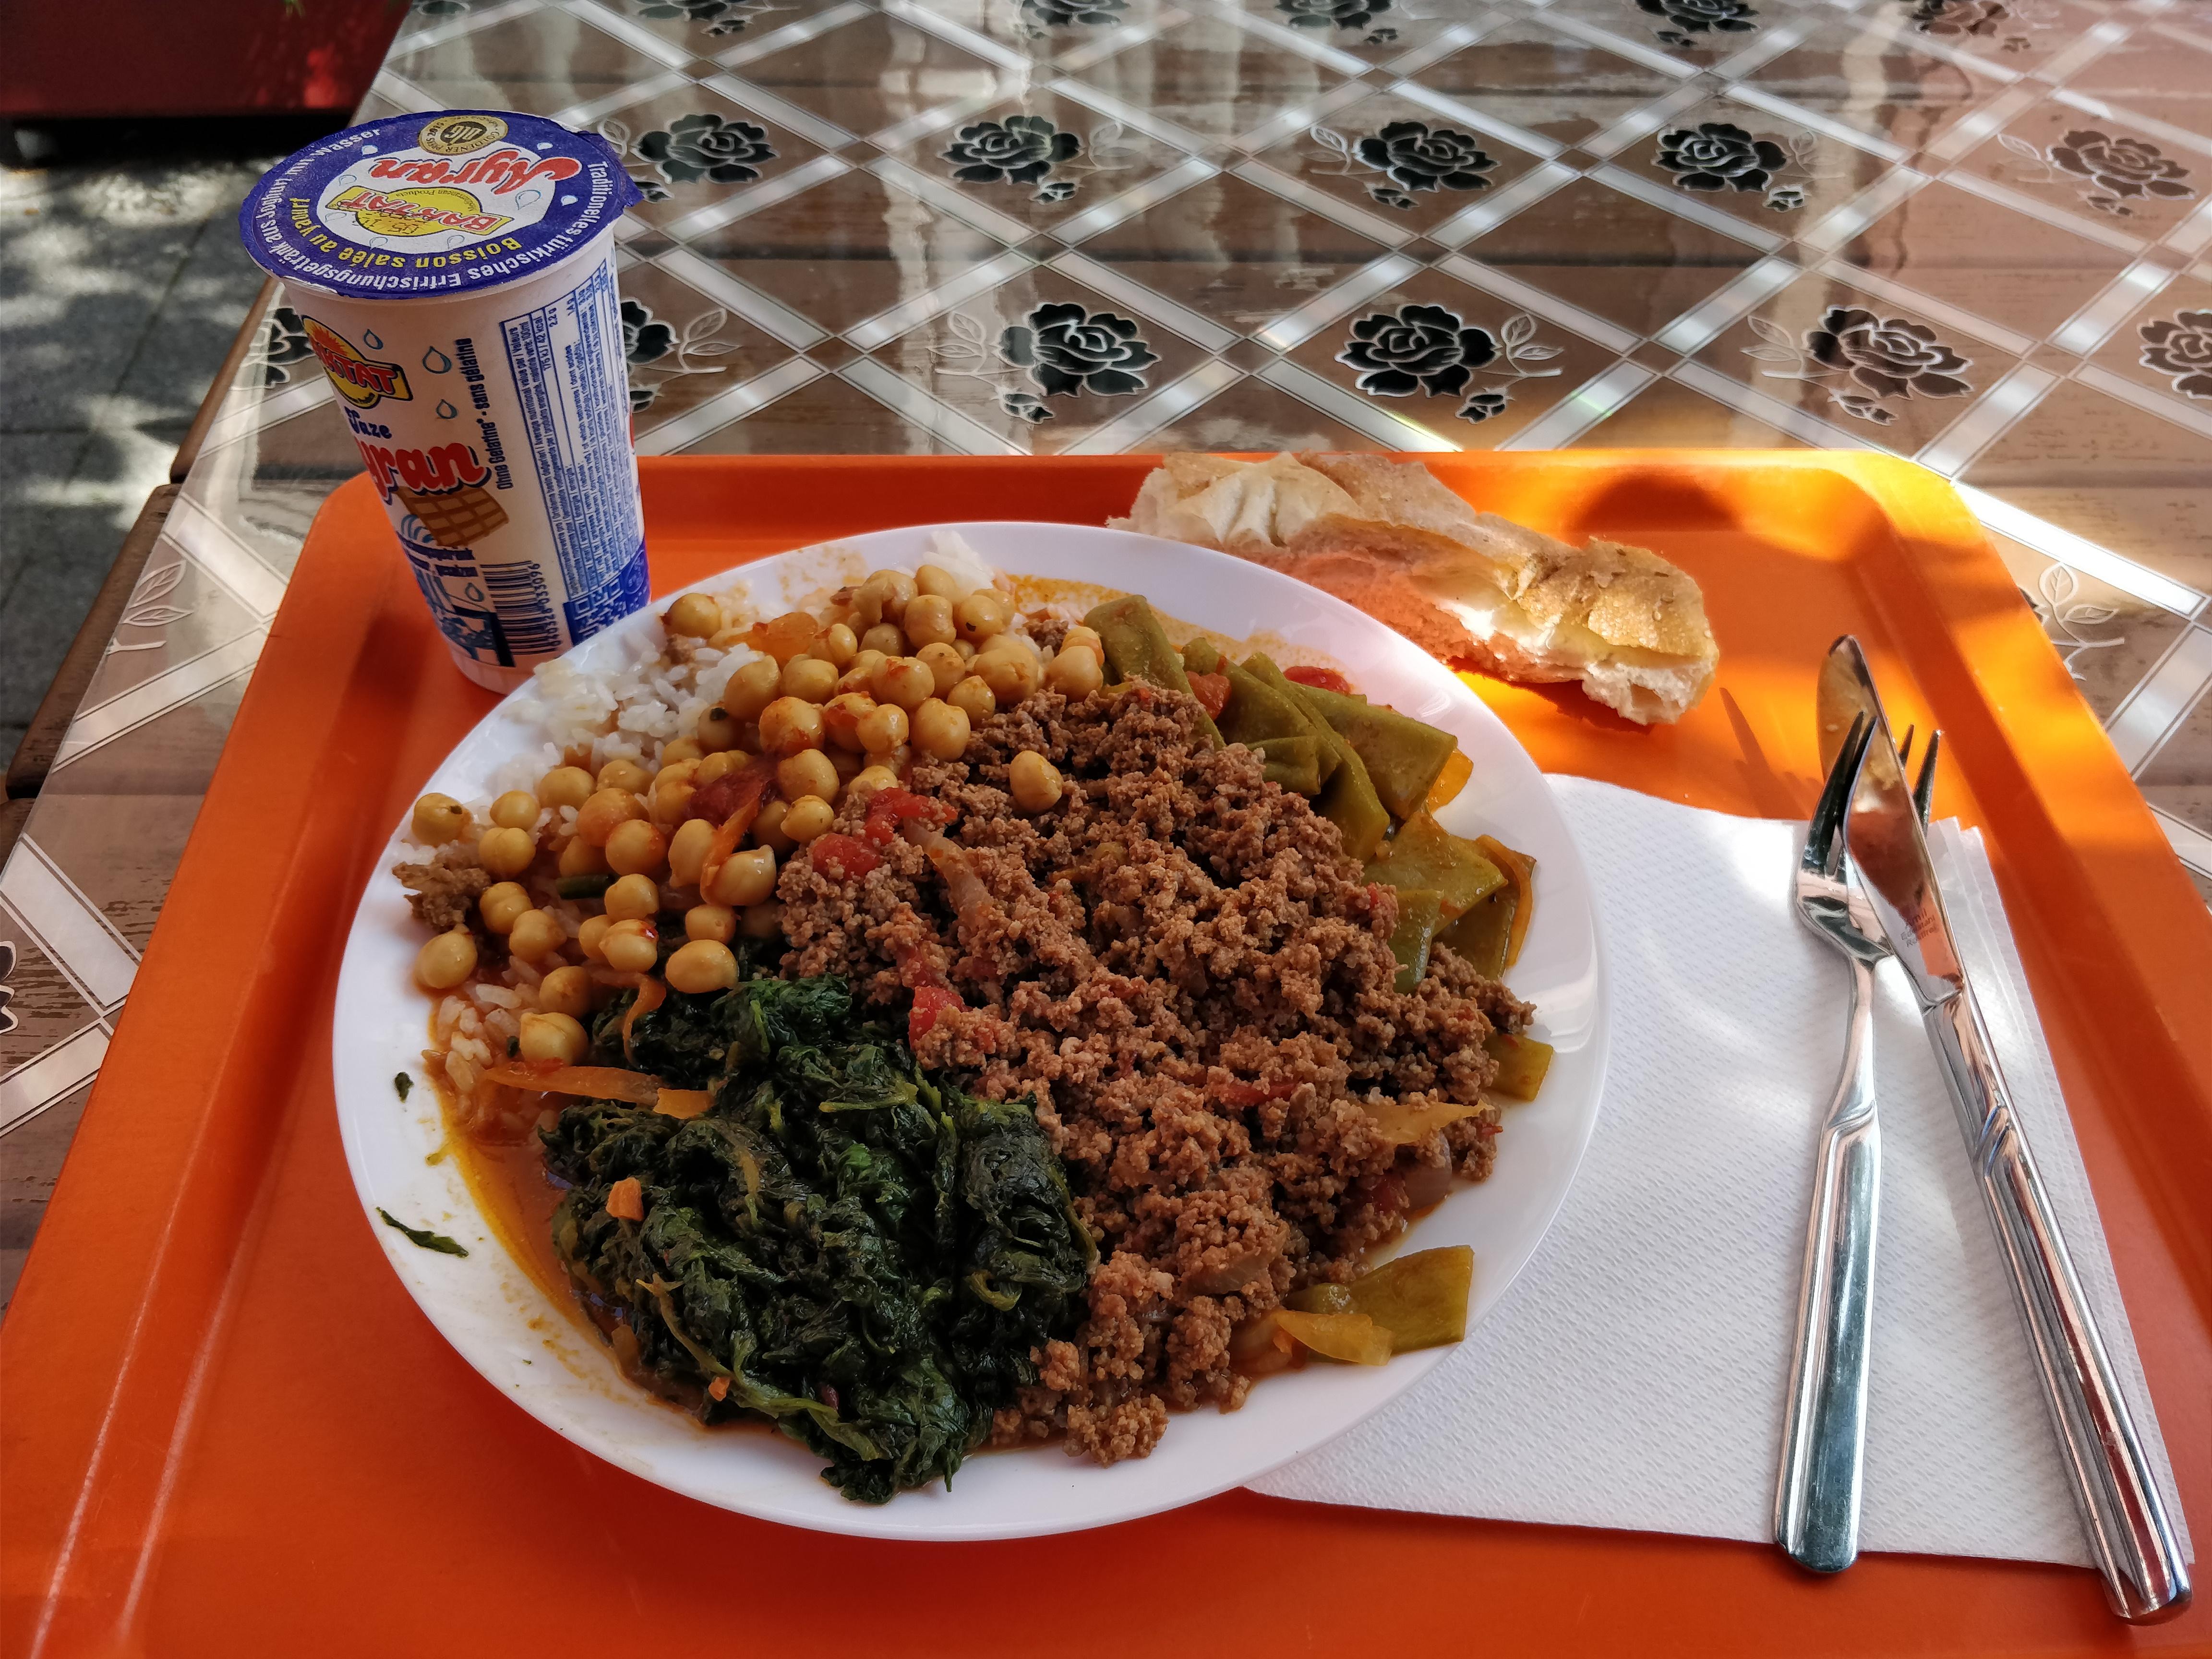 http://foodloader.net/nico_2017-08-25_reis-fleisch-spinat-gemuese-kichererbsen.jpg